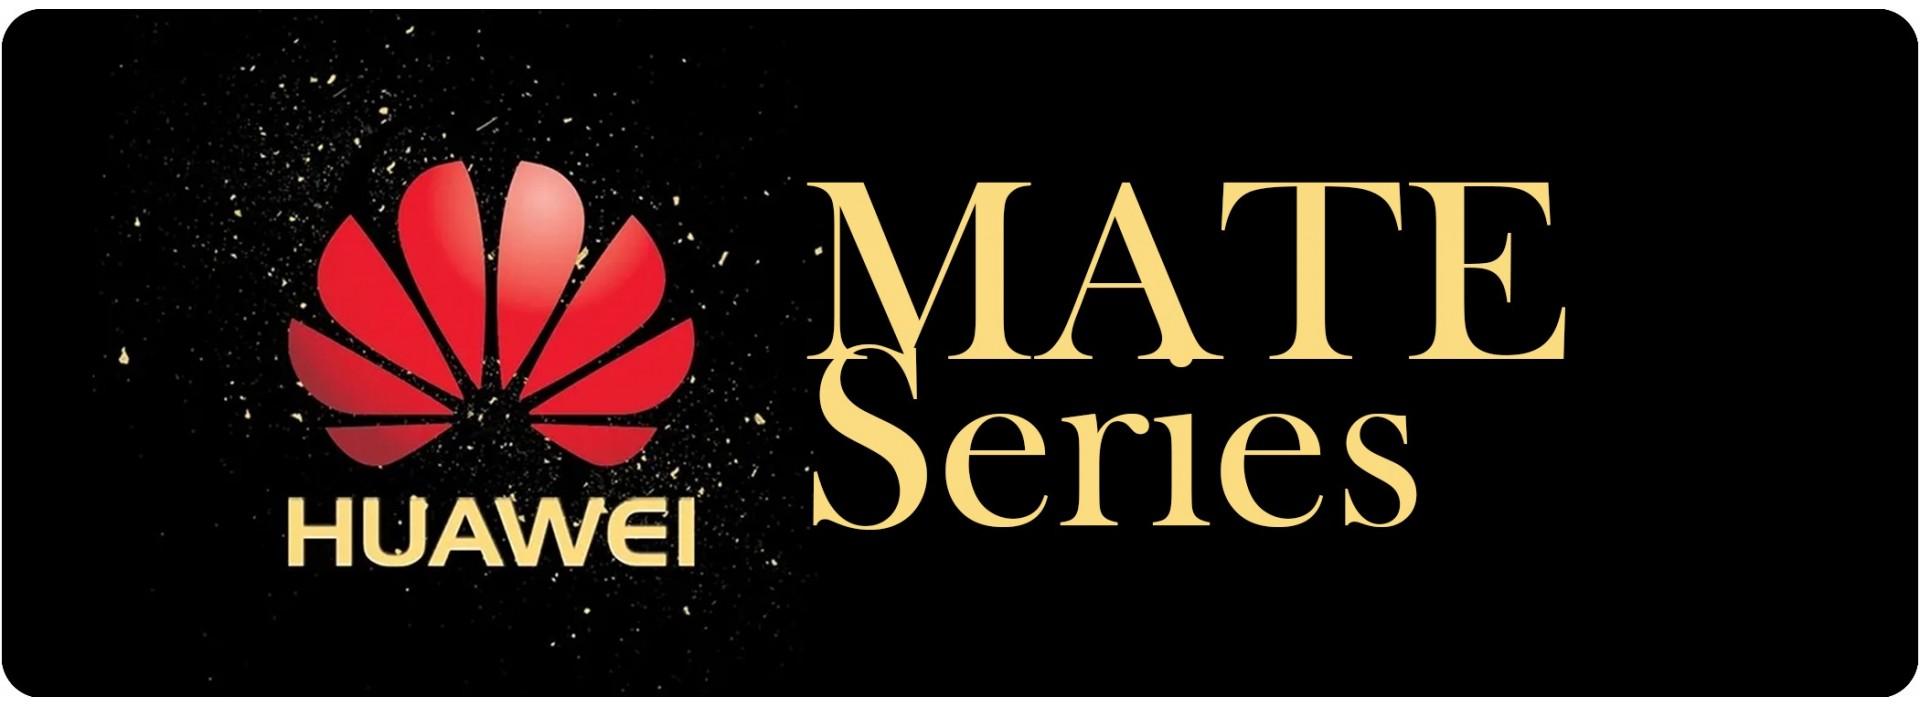 Fundas para Huawei Serie Mate